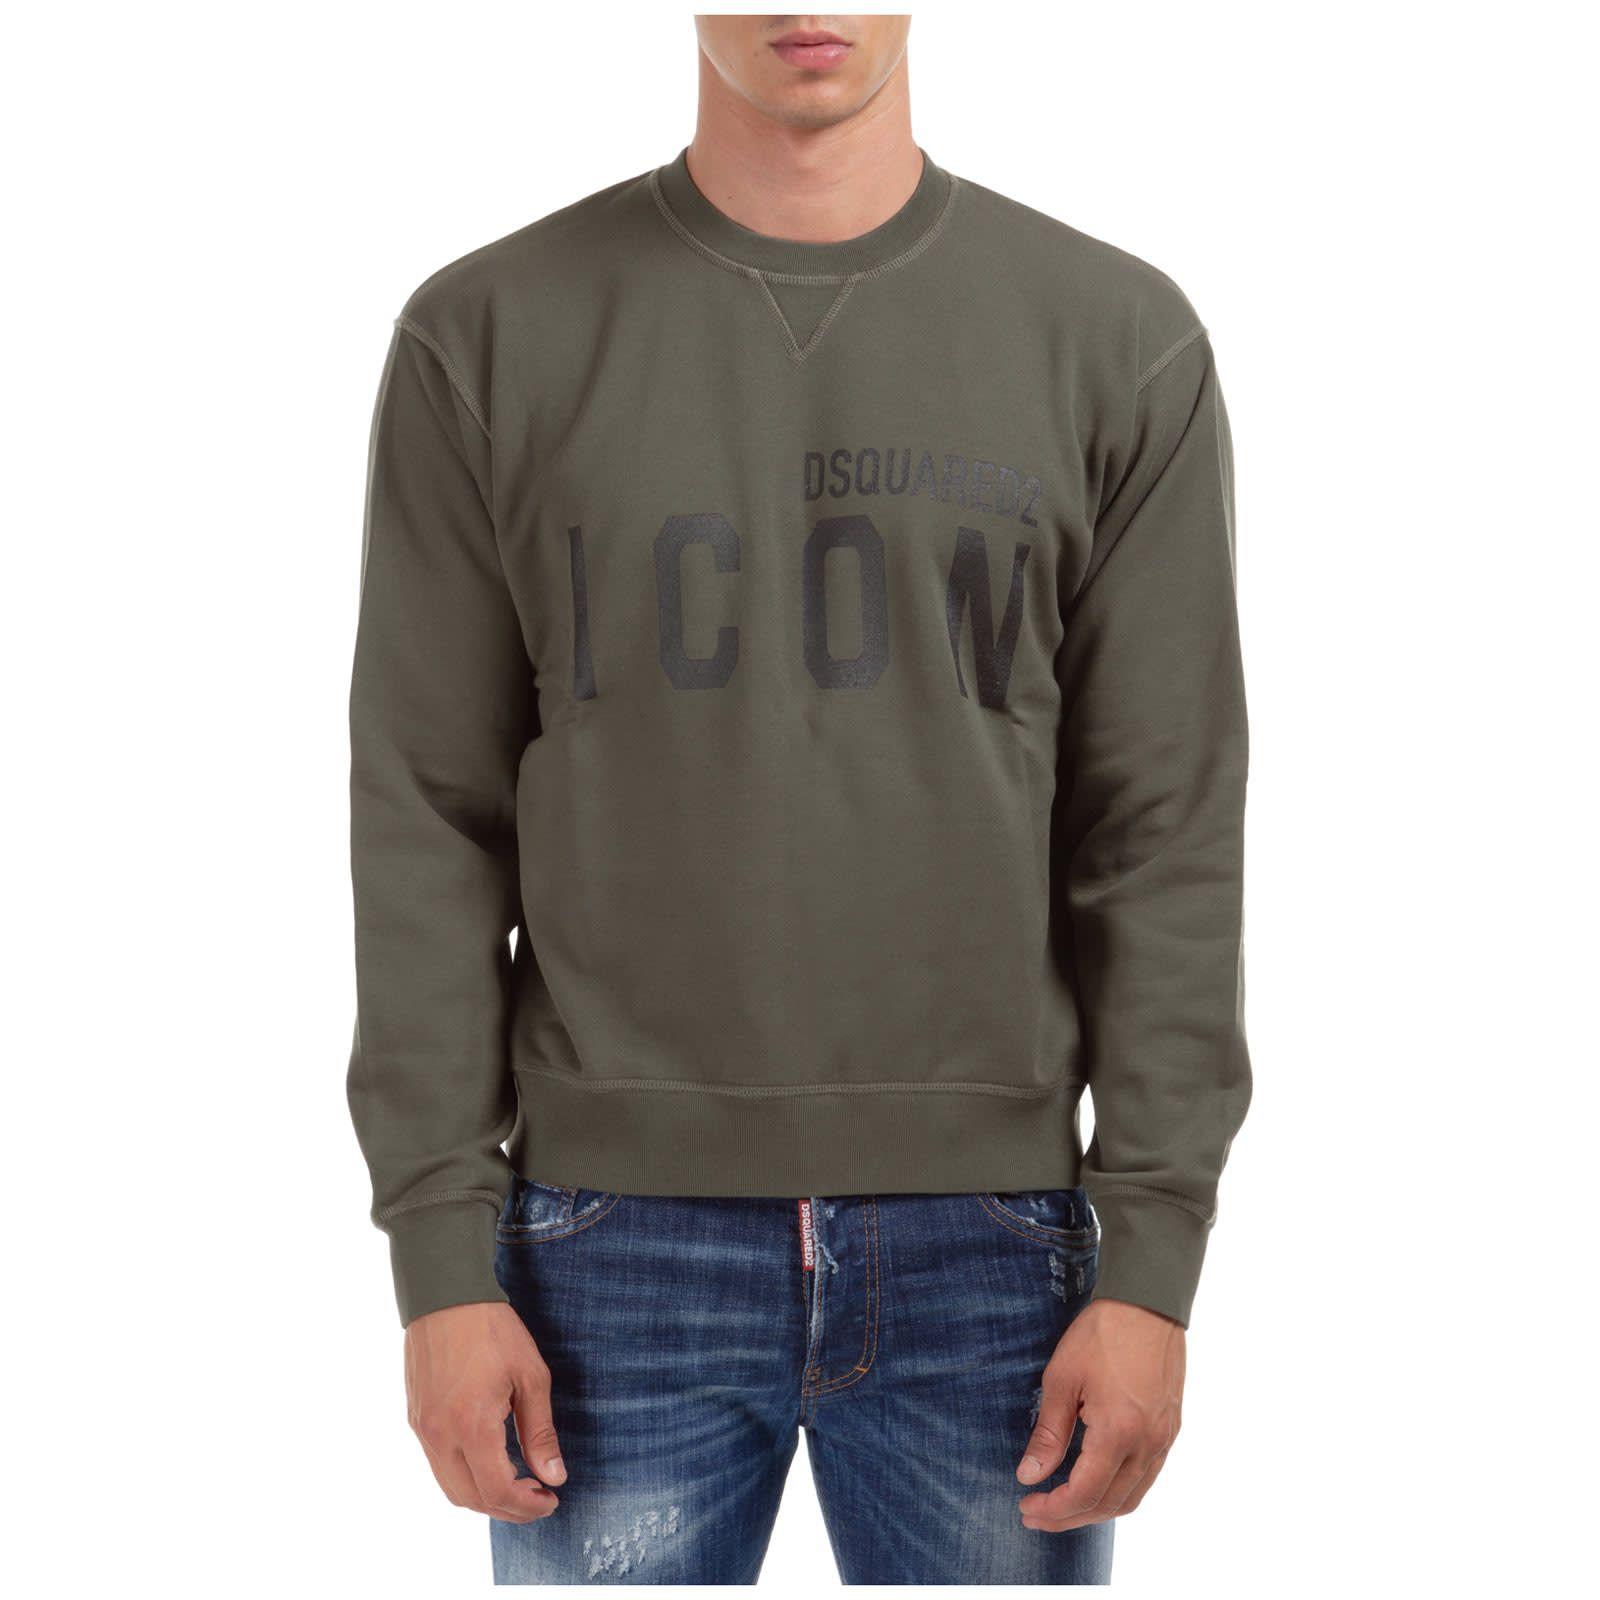 Icon Sweatshirt In 2021 Sweatshirts Long Sleeve Tshirt Men Dsquared2 [ 1600 x 1600 Pixel ]